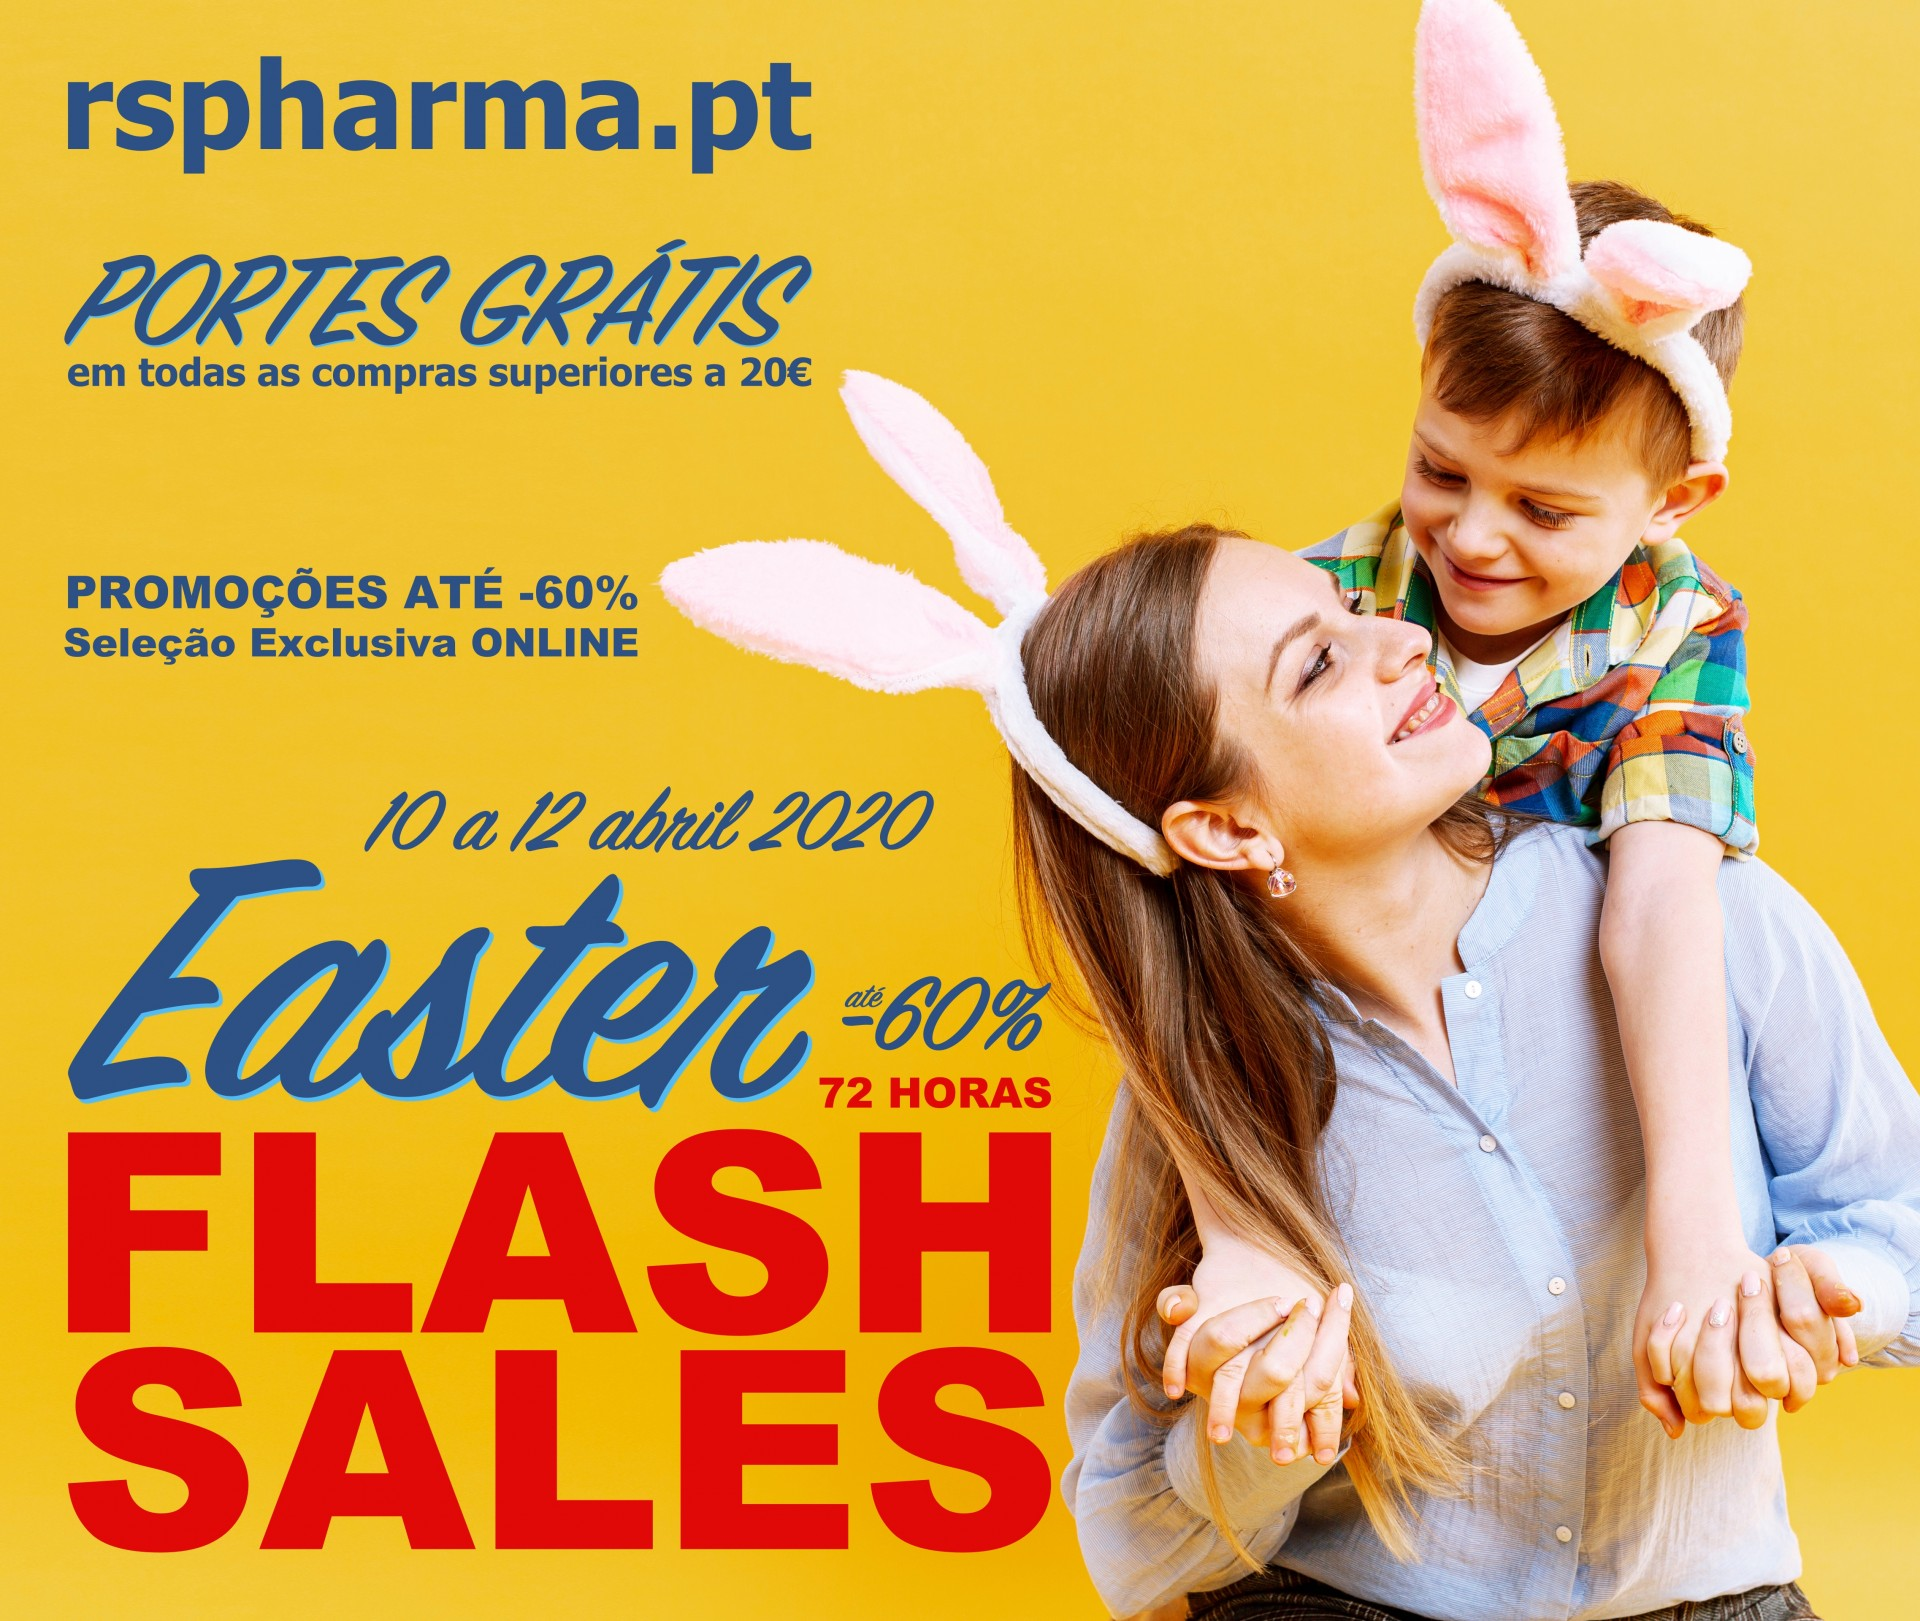 Easter FLASH SALES